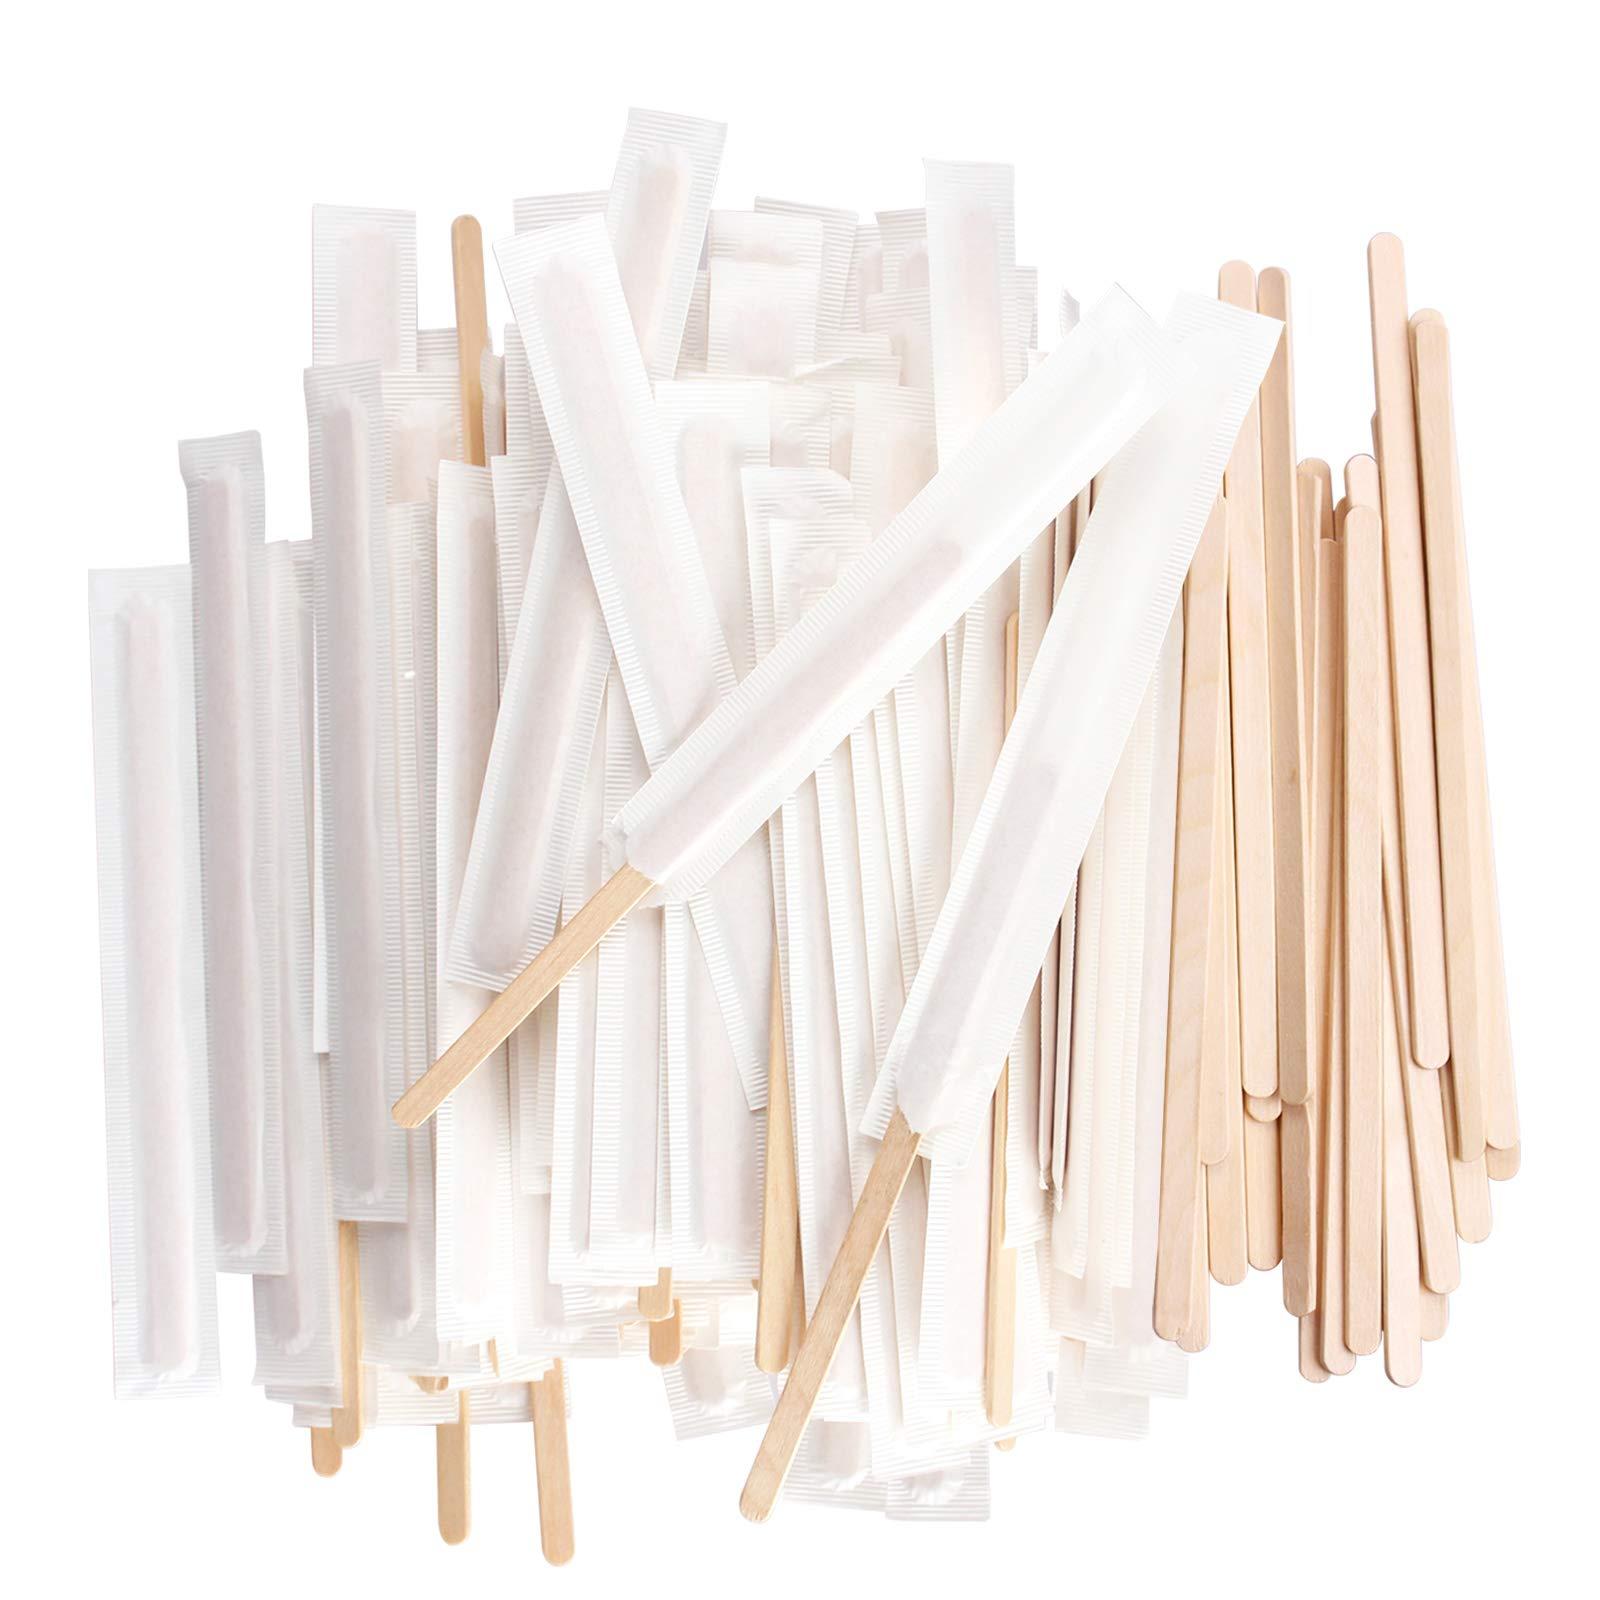 Disposable Birchwood Tea Wood Coffee Stir Sticks Wooden Stirrers 500 Pcs (5.5 inch Paper Wrapped premium quality)